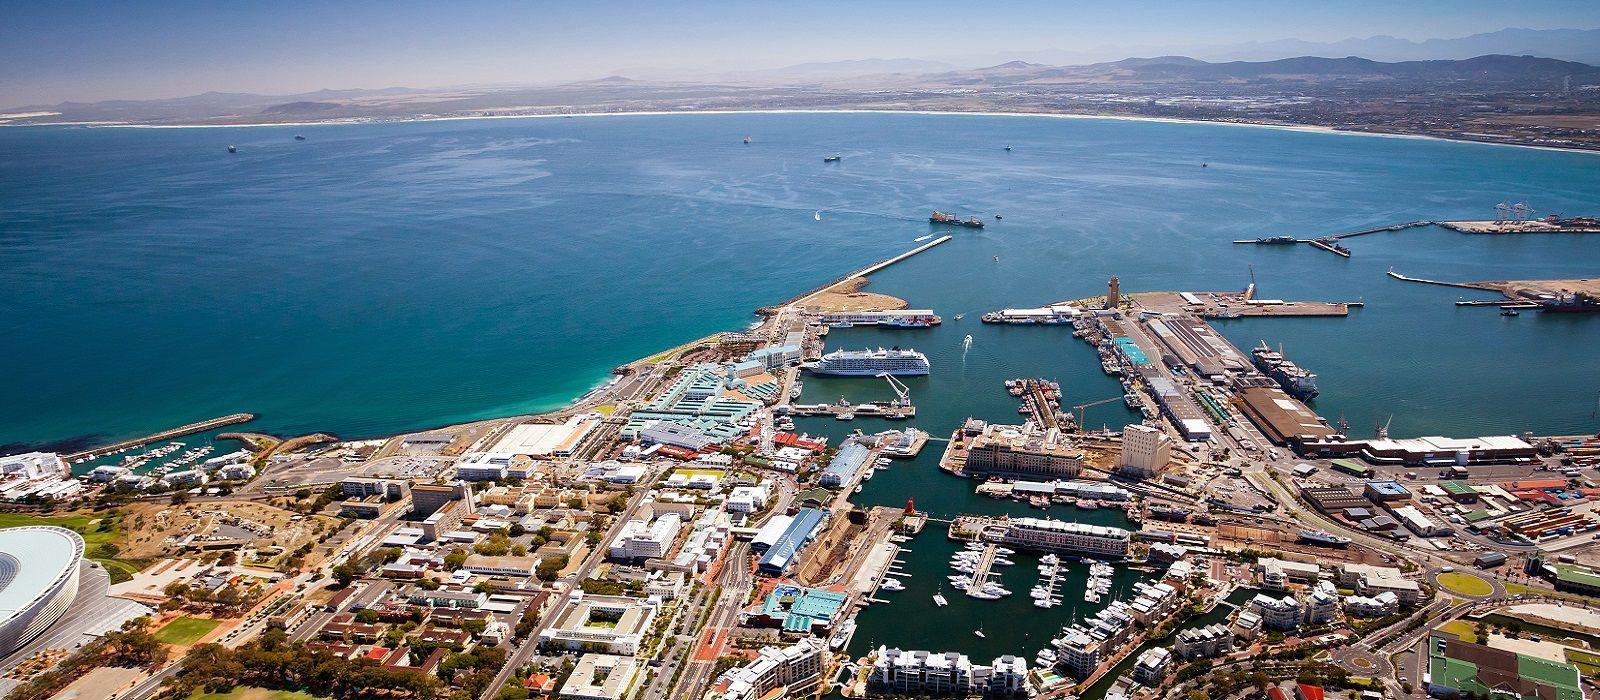 Reiseziel Kapstadt Hafenviertel (V&A Waterfront) Südafrika